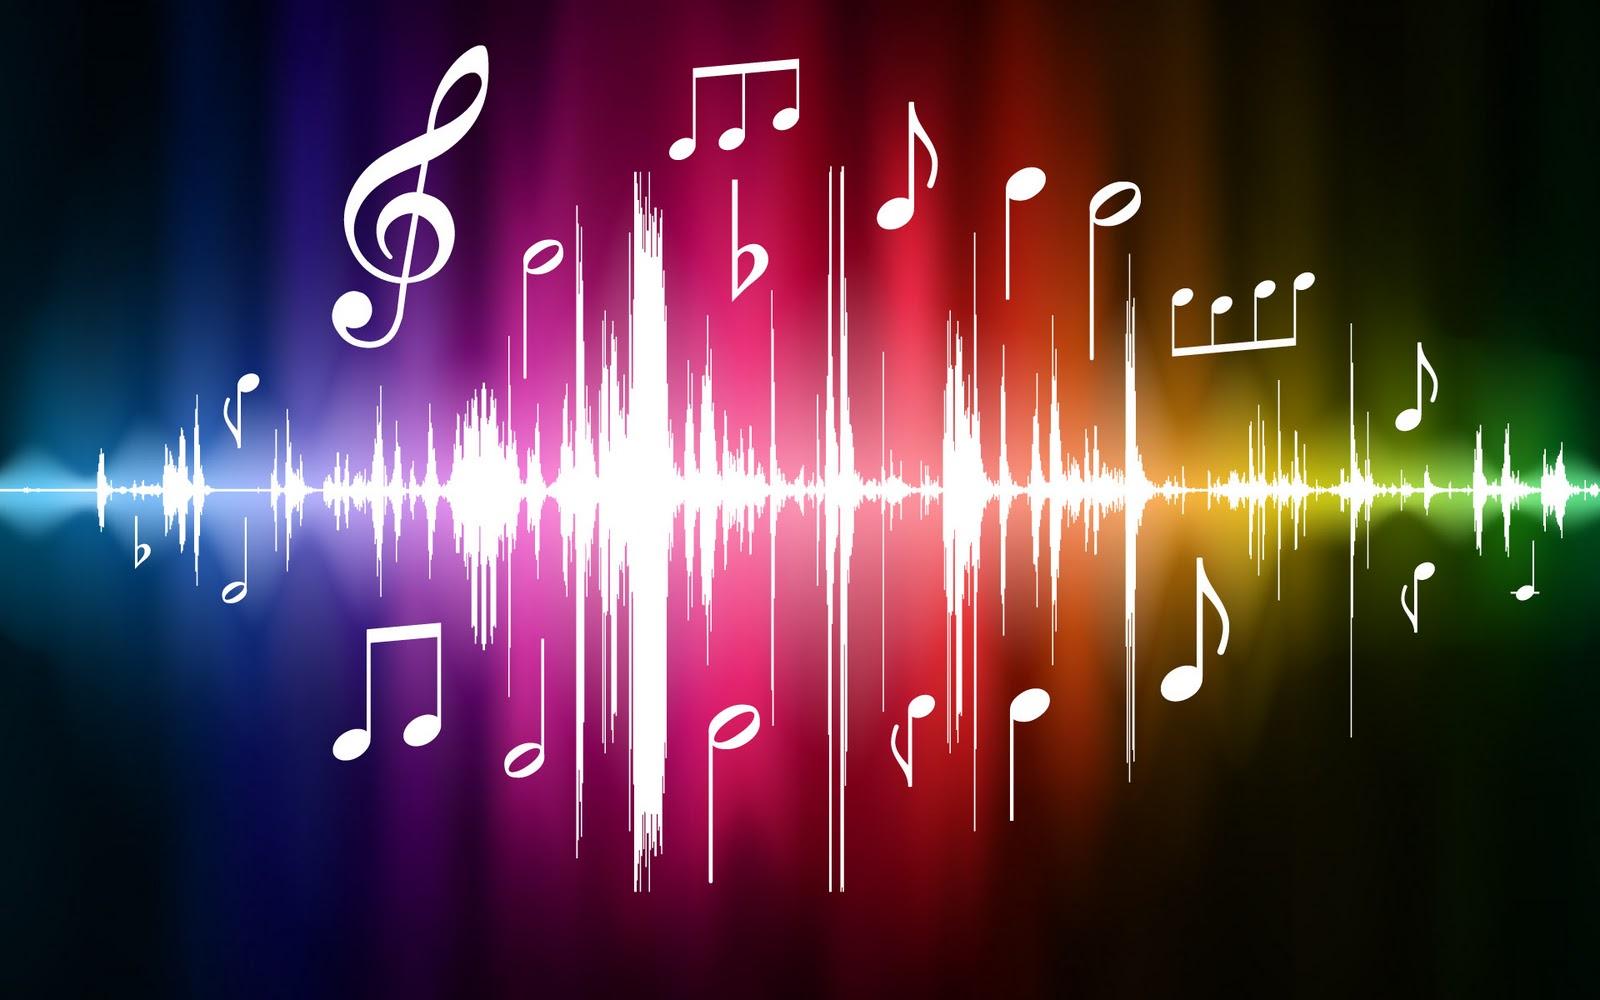 Club 4 Buzz: Music Wallpaper